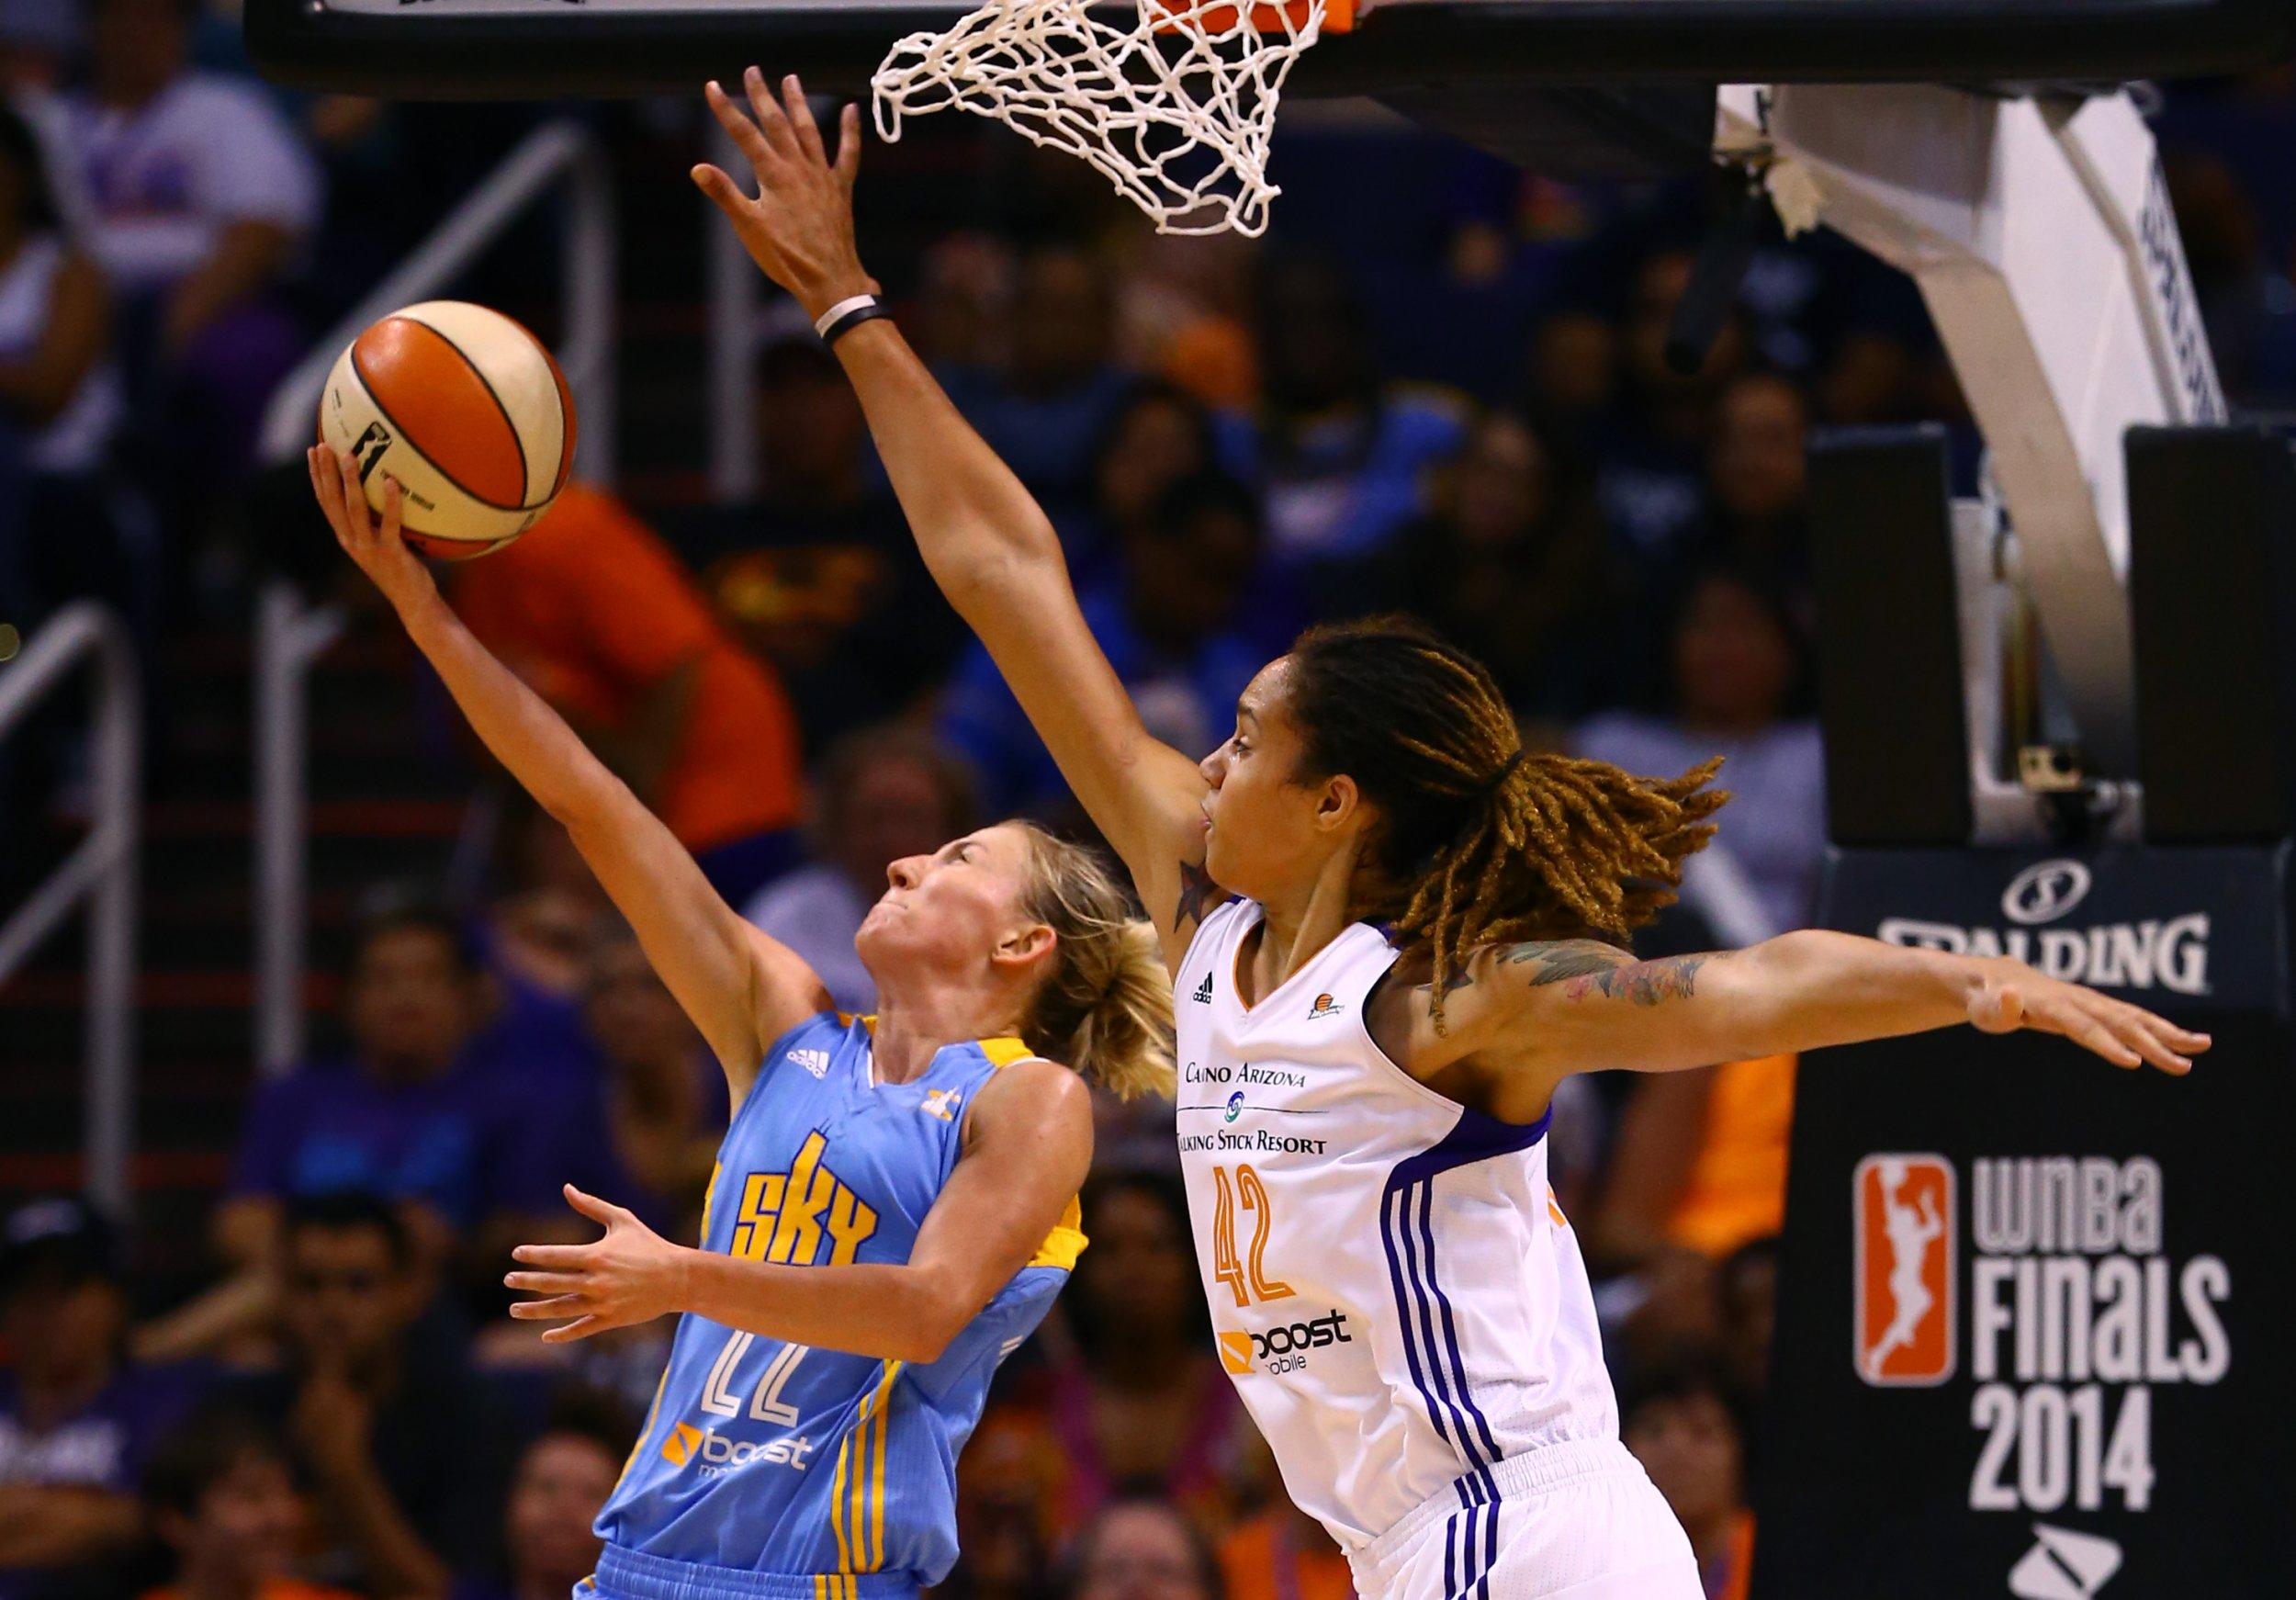 WNBA Closes the (Statistical) Numbers Gap